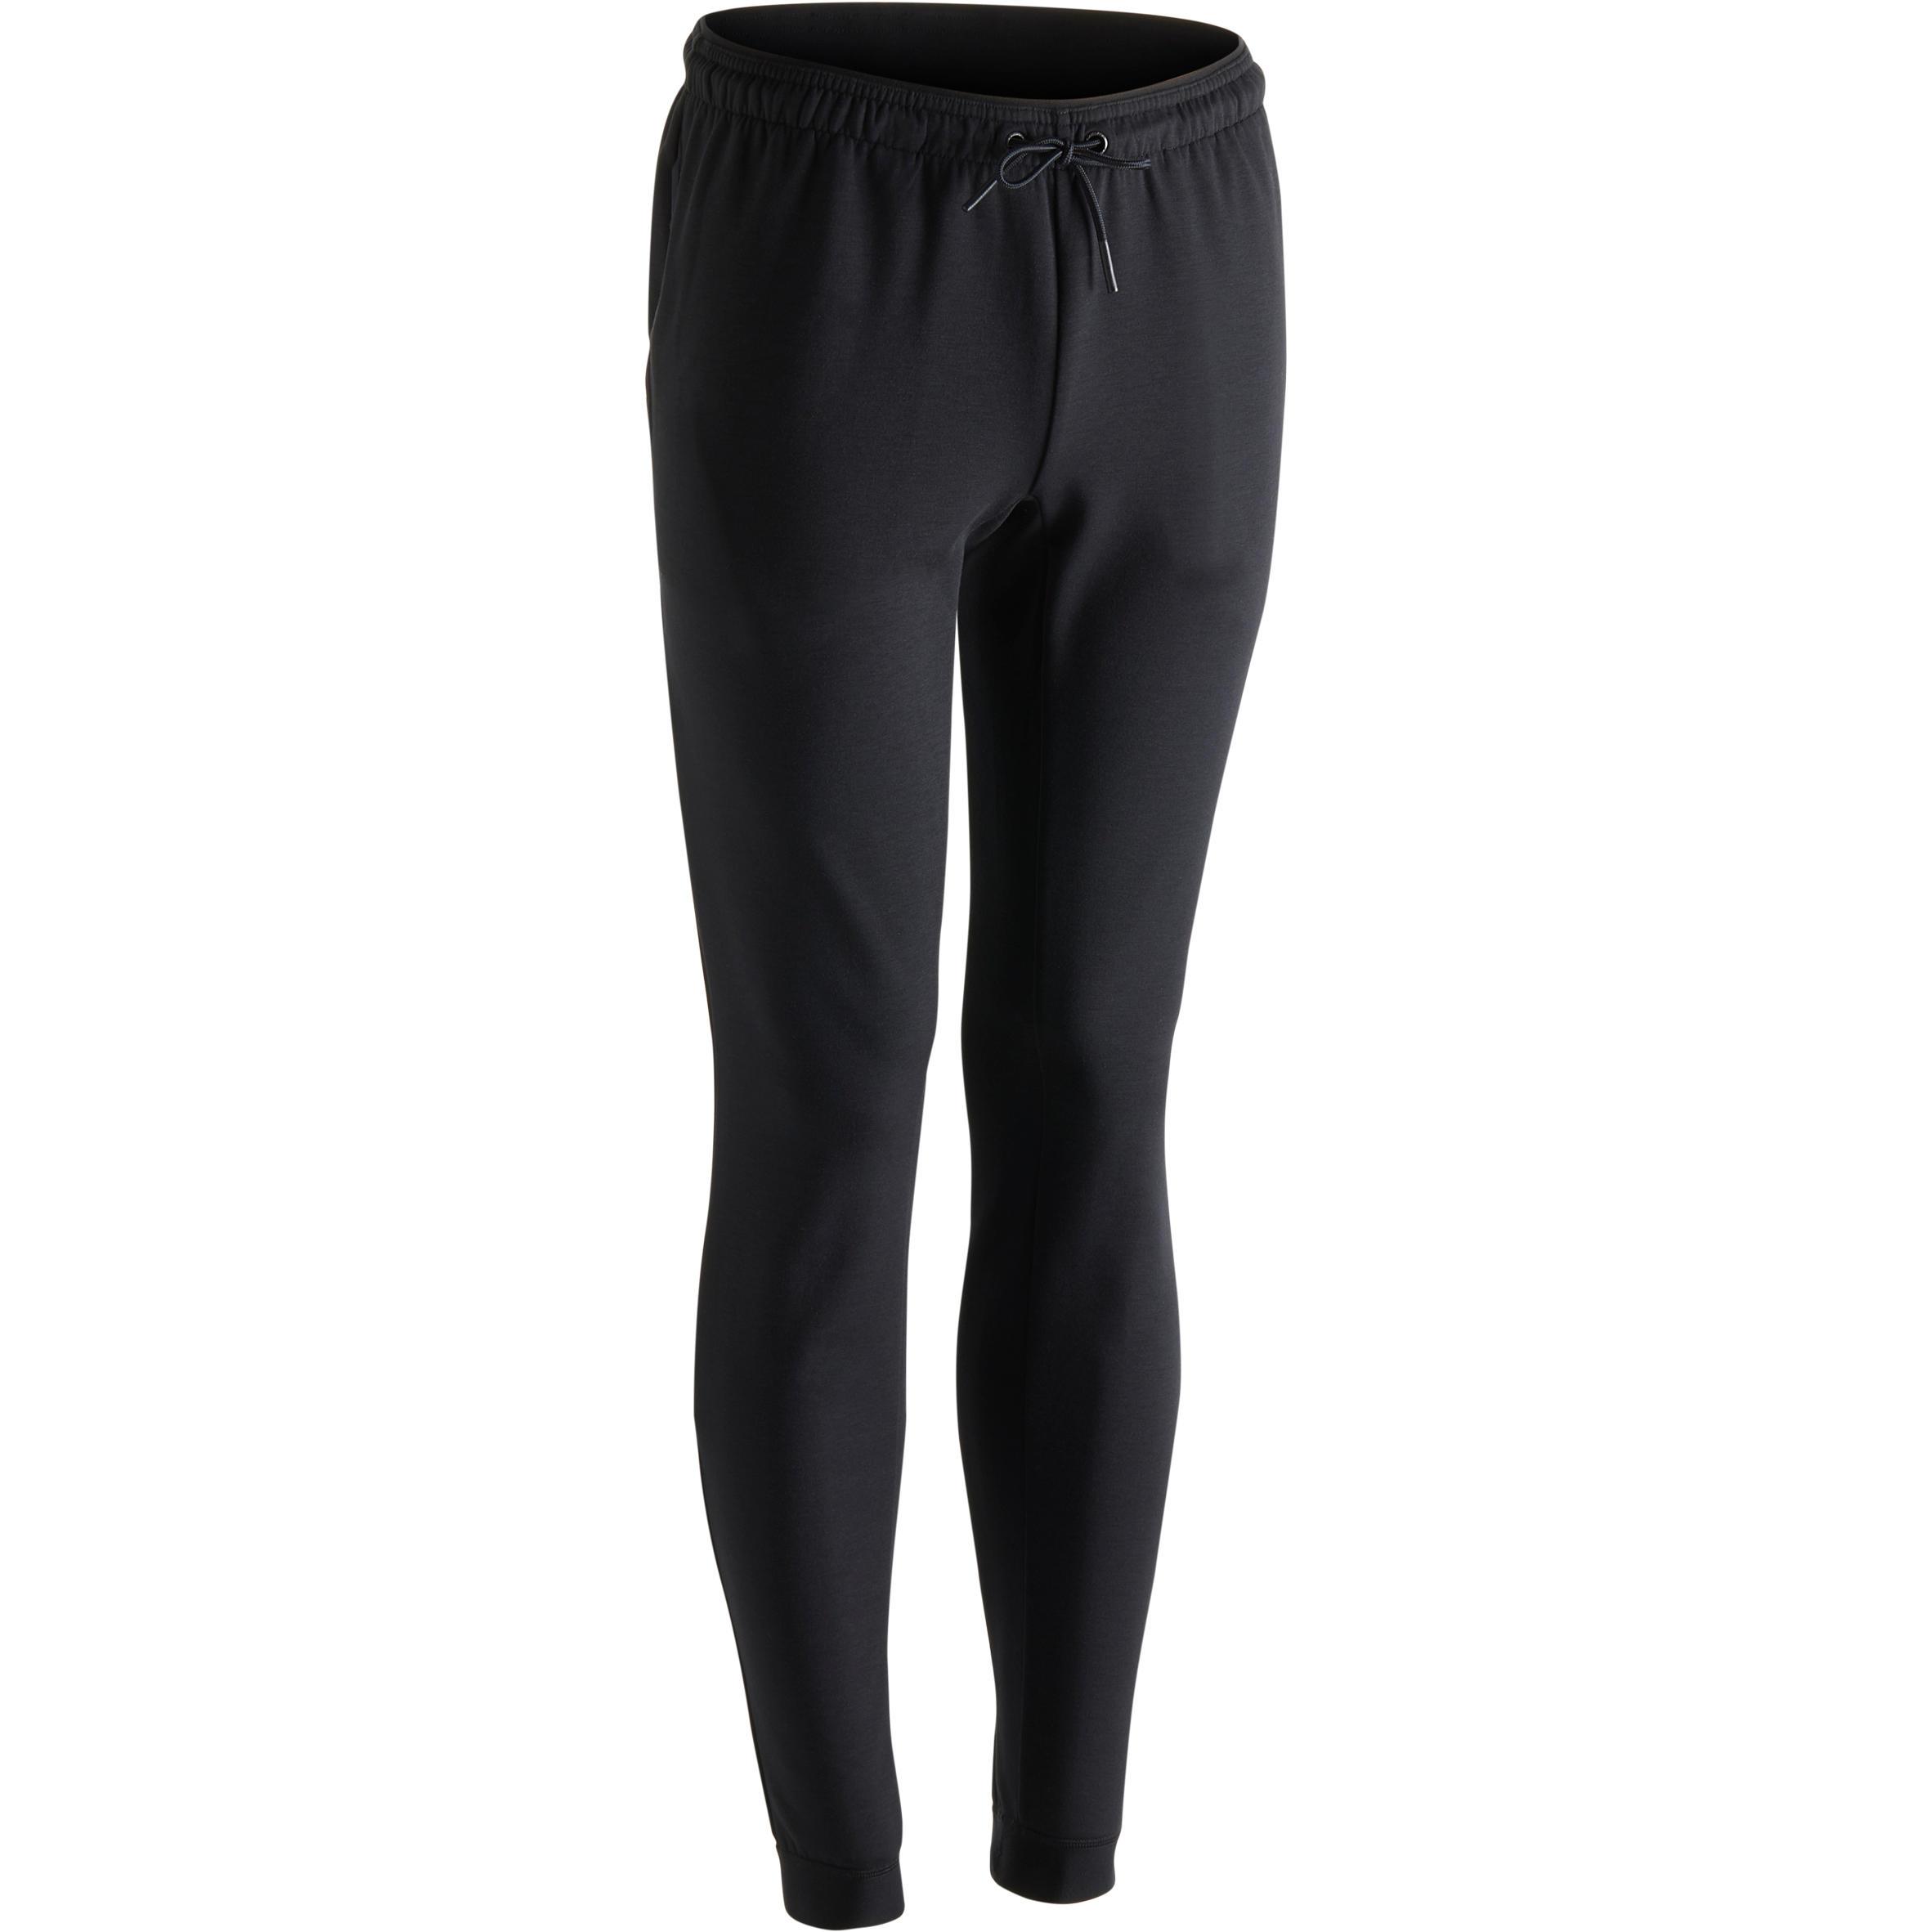 Domyos Herenbroek 560 voor gym en pilates, skinny fit, zwart